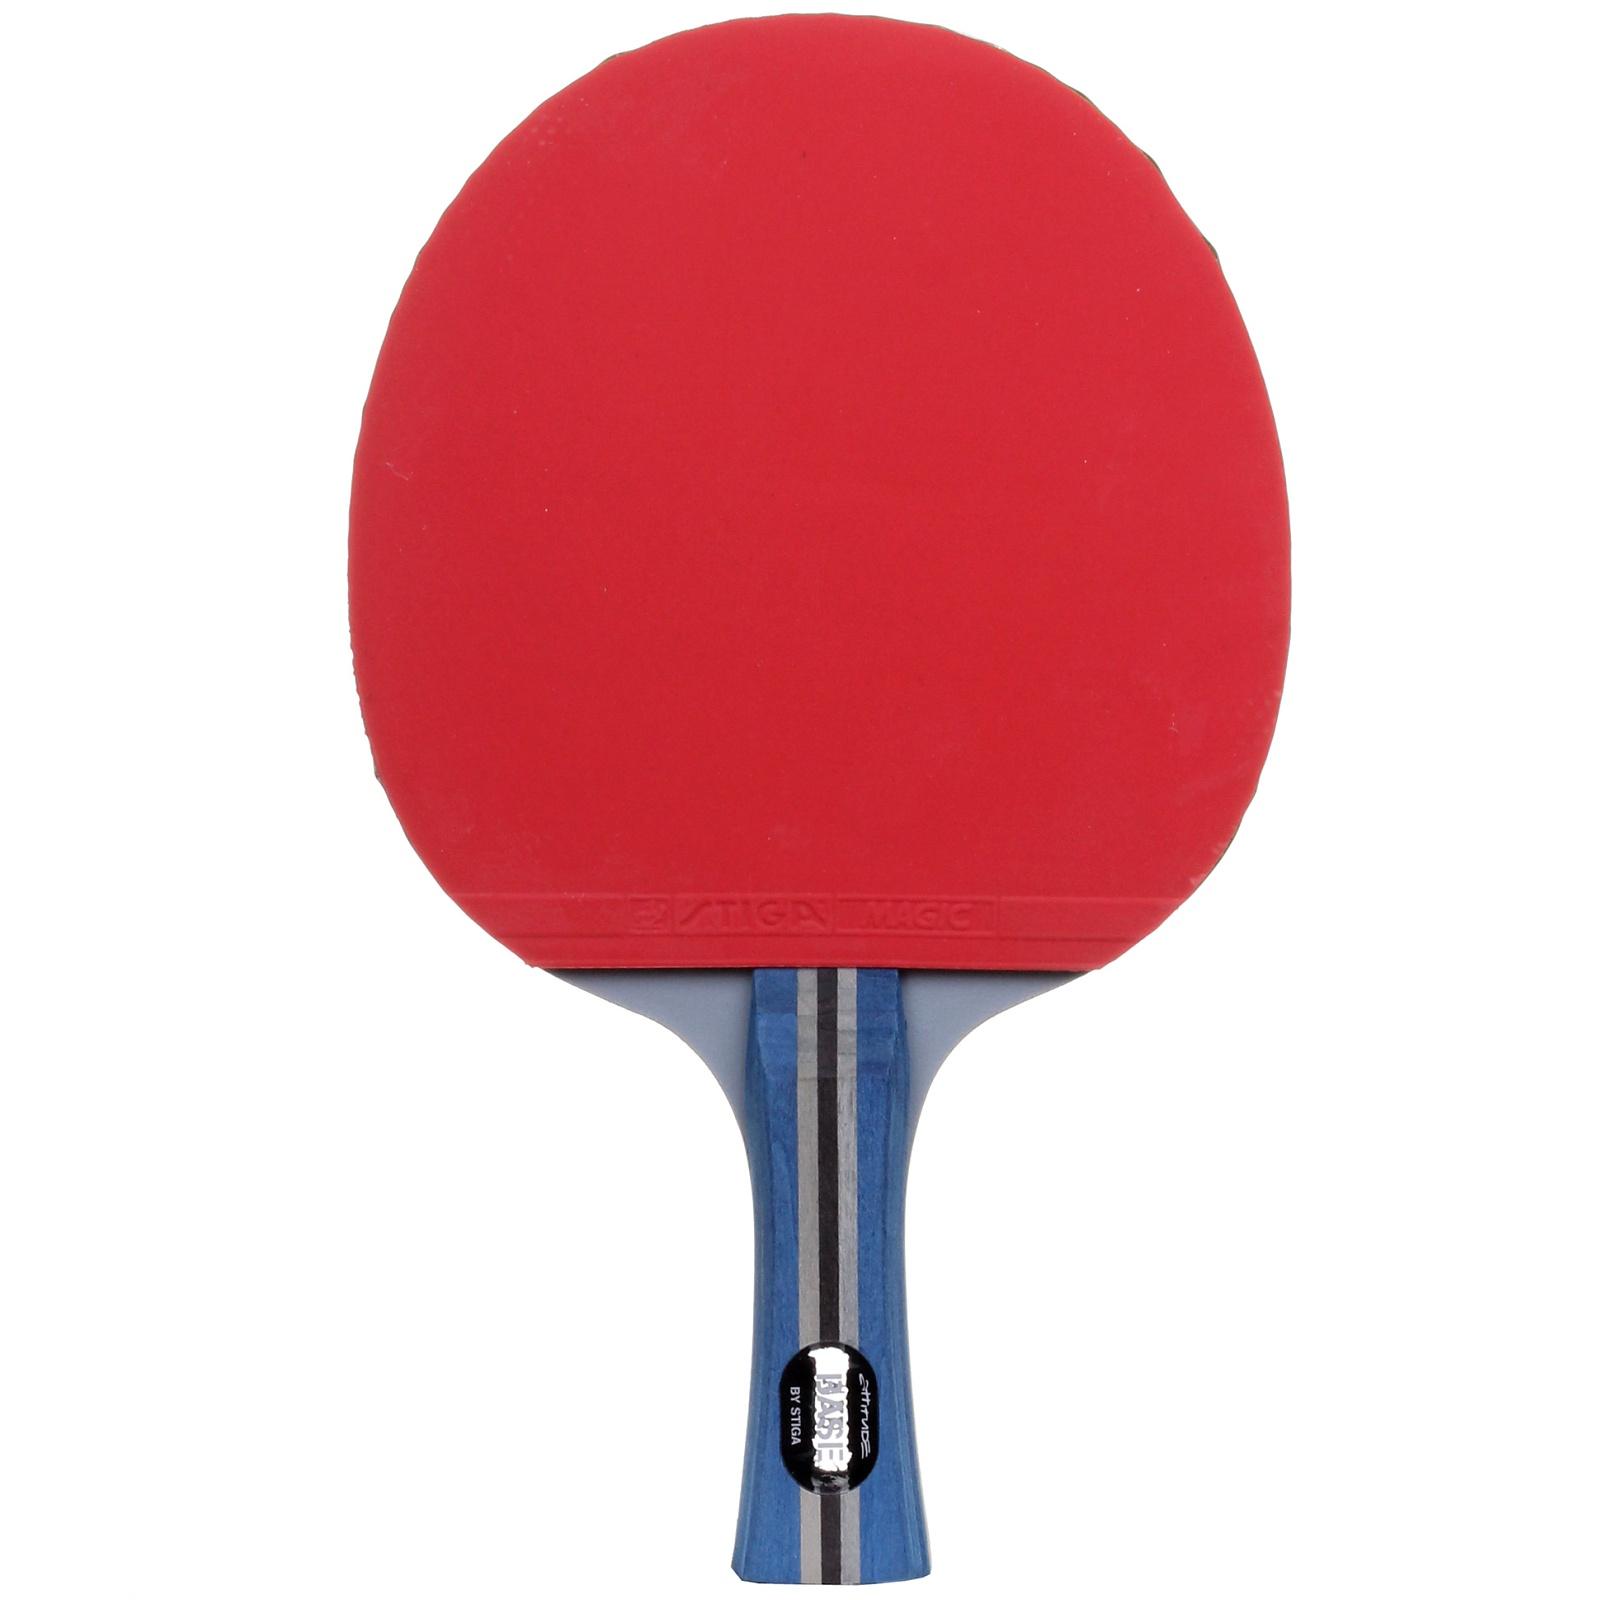 Pálka na stolní tenis STIGA Base